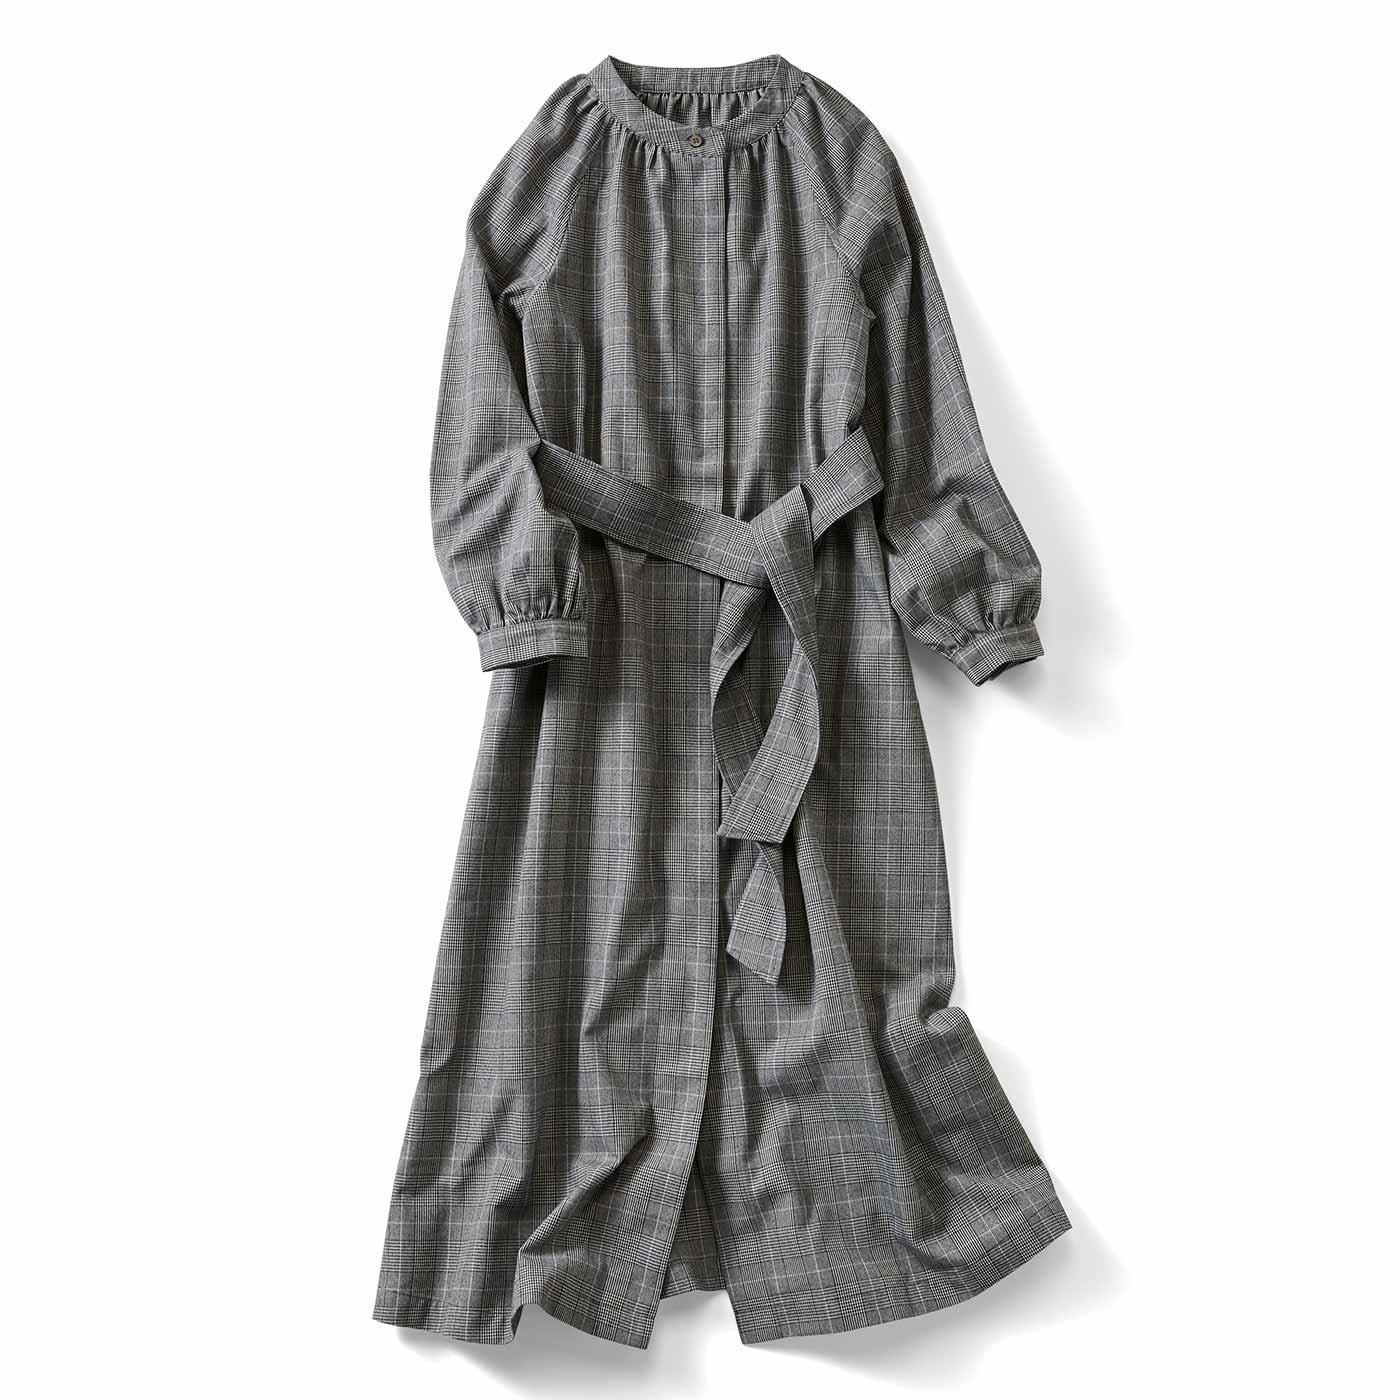 IEDIT[イディット] グレンチェック柄の着こなし自由なワンピースコート〈ブラック〉